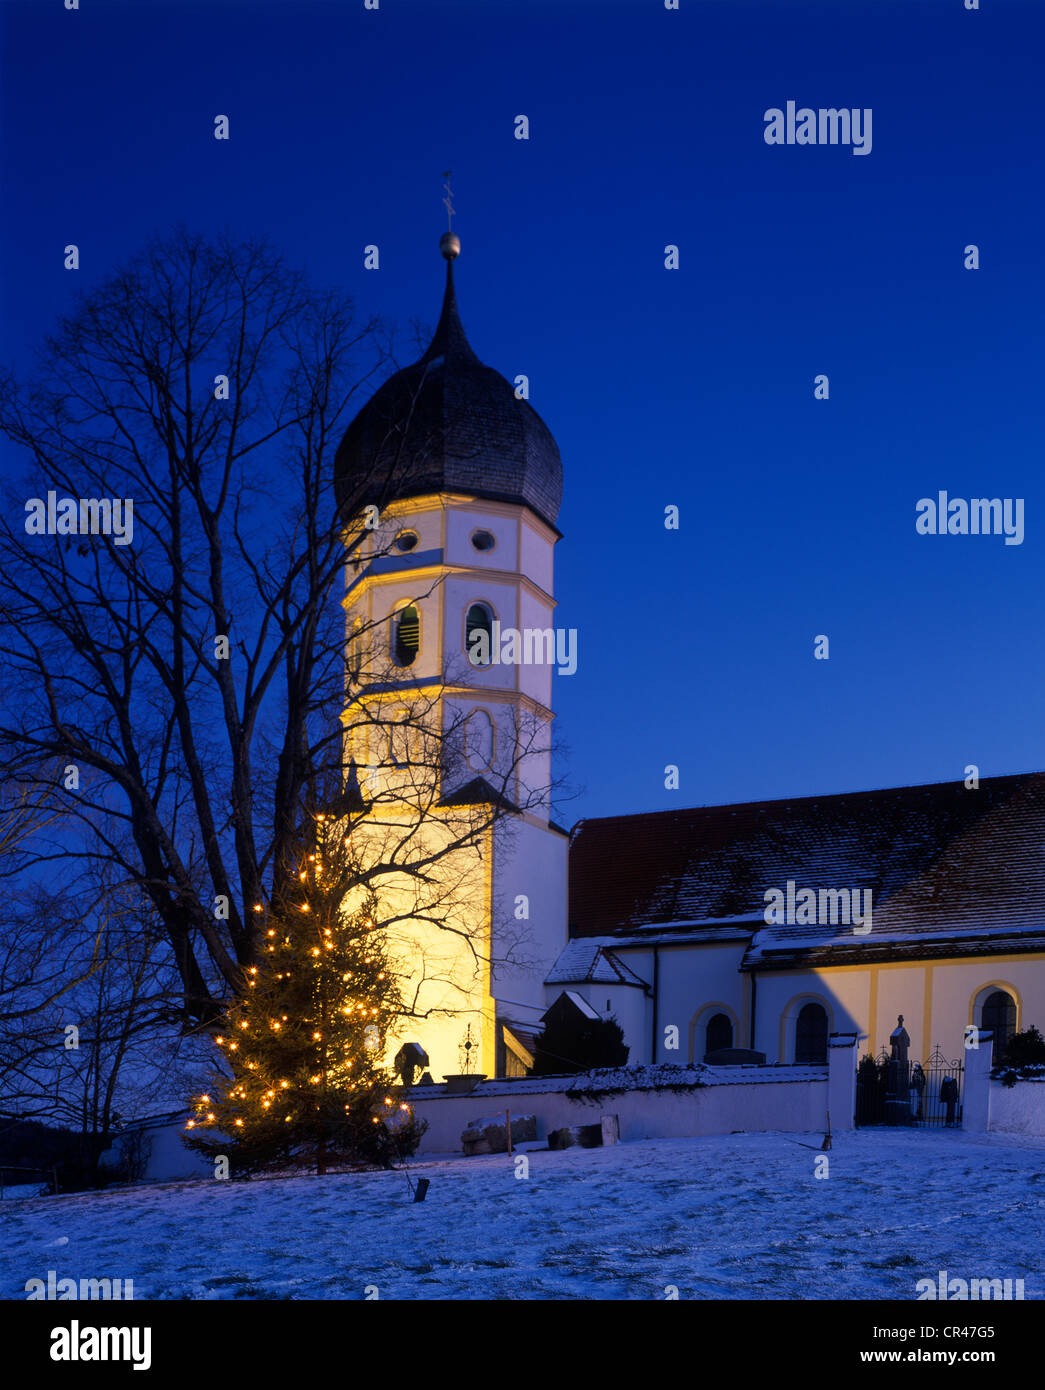 Chapel of Ease of St. John the Baptist and St. George, Holzhausen, Muensing, Upper Bavaria, Germany, Europe - Stock Image